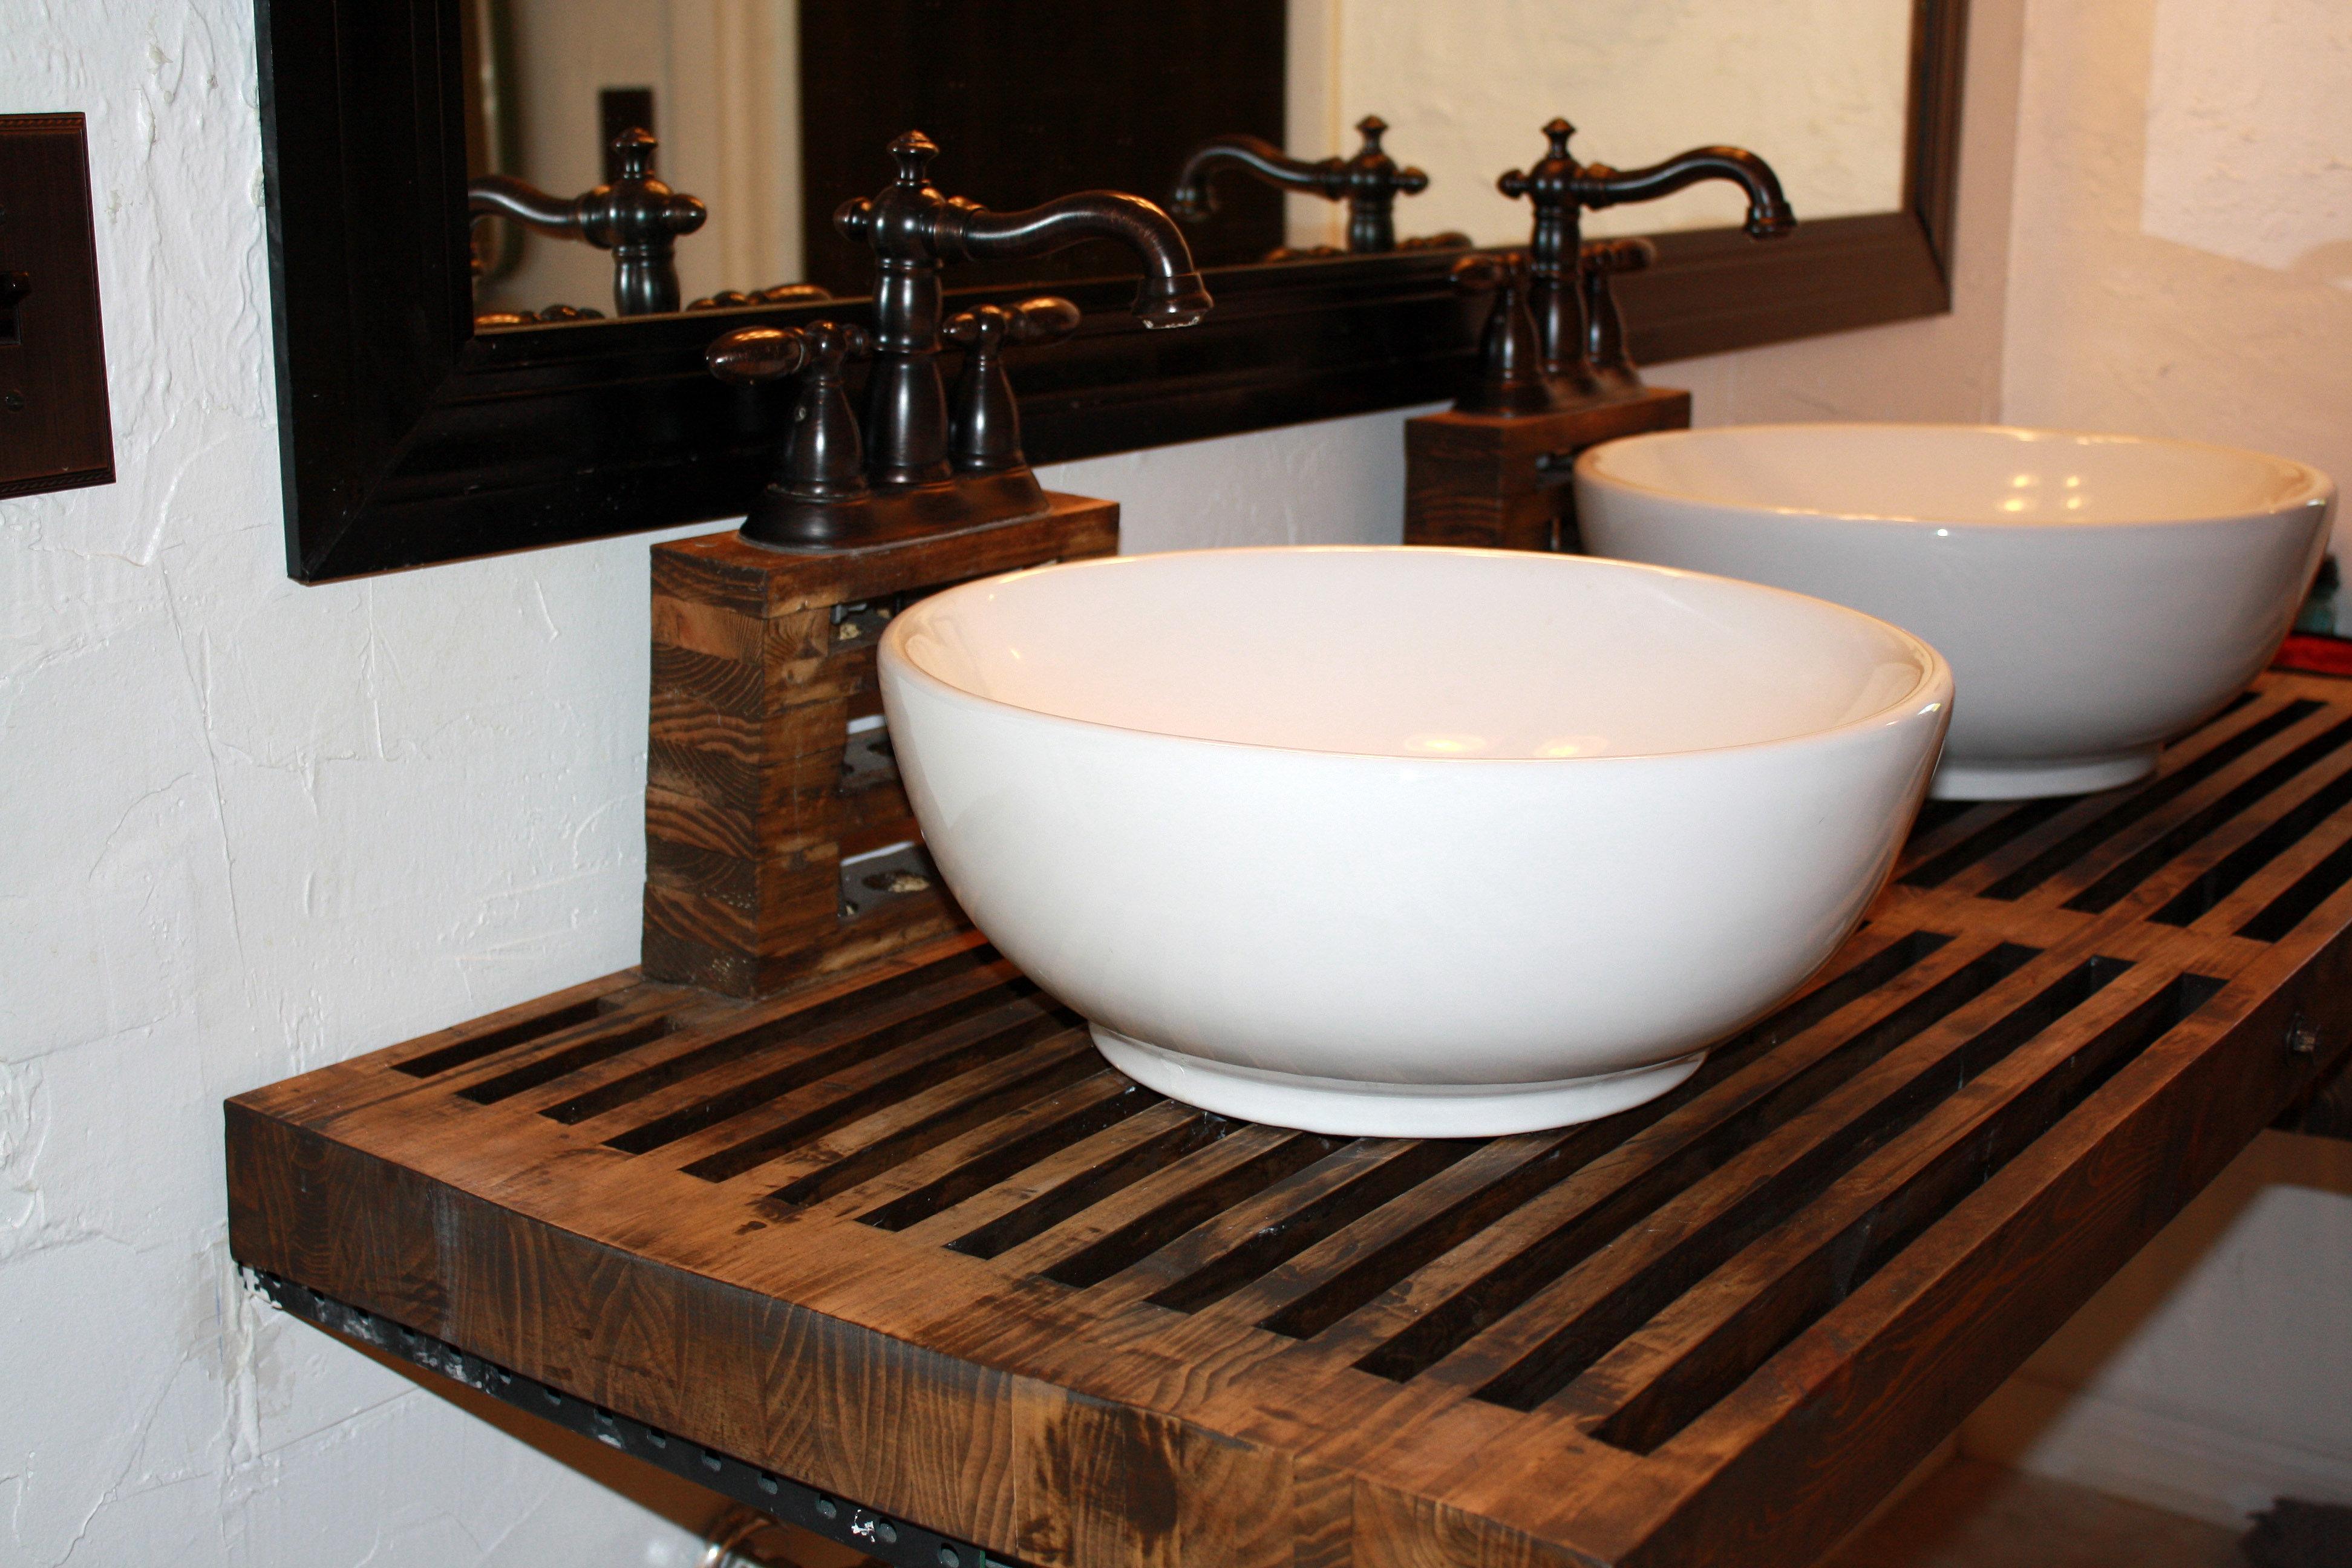 Rustic Furniture Denver Custom Furniture and Decor | Denver, Colorado | Custom rustic vanity